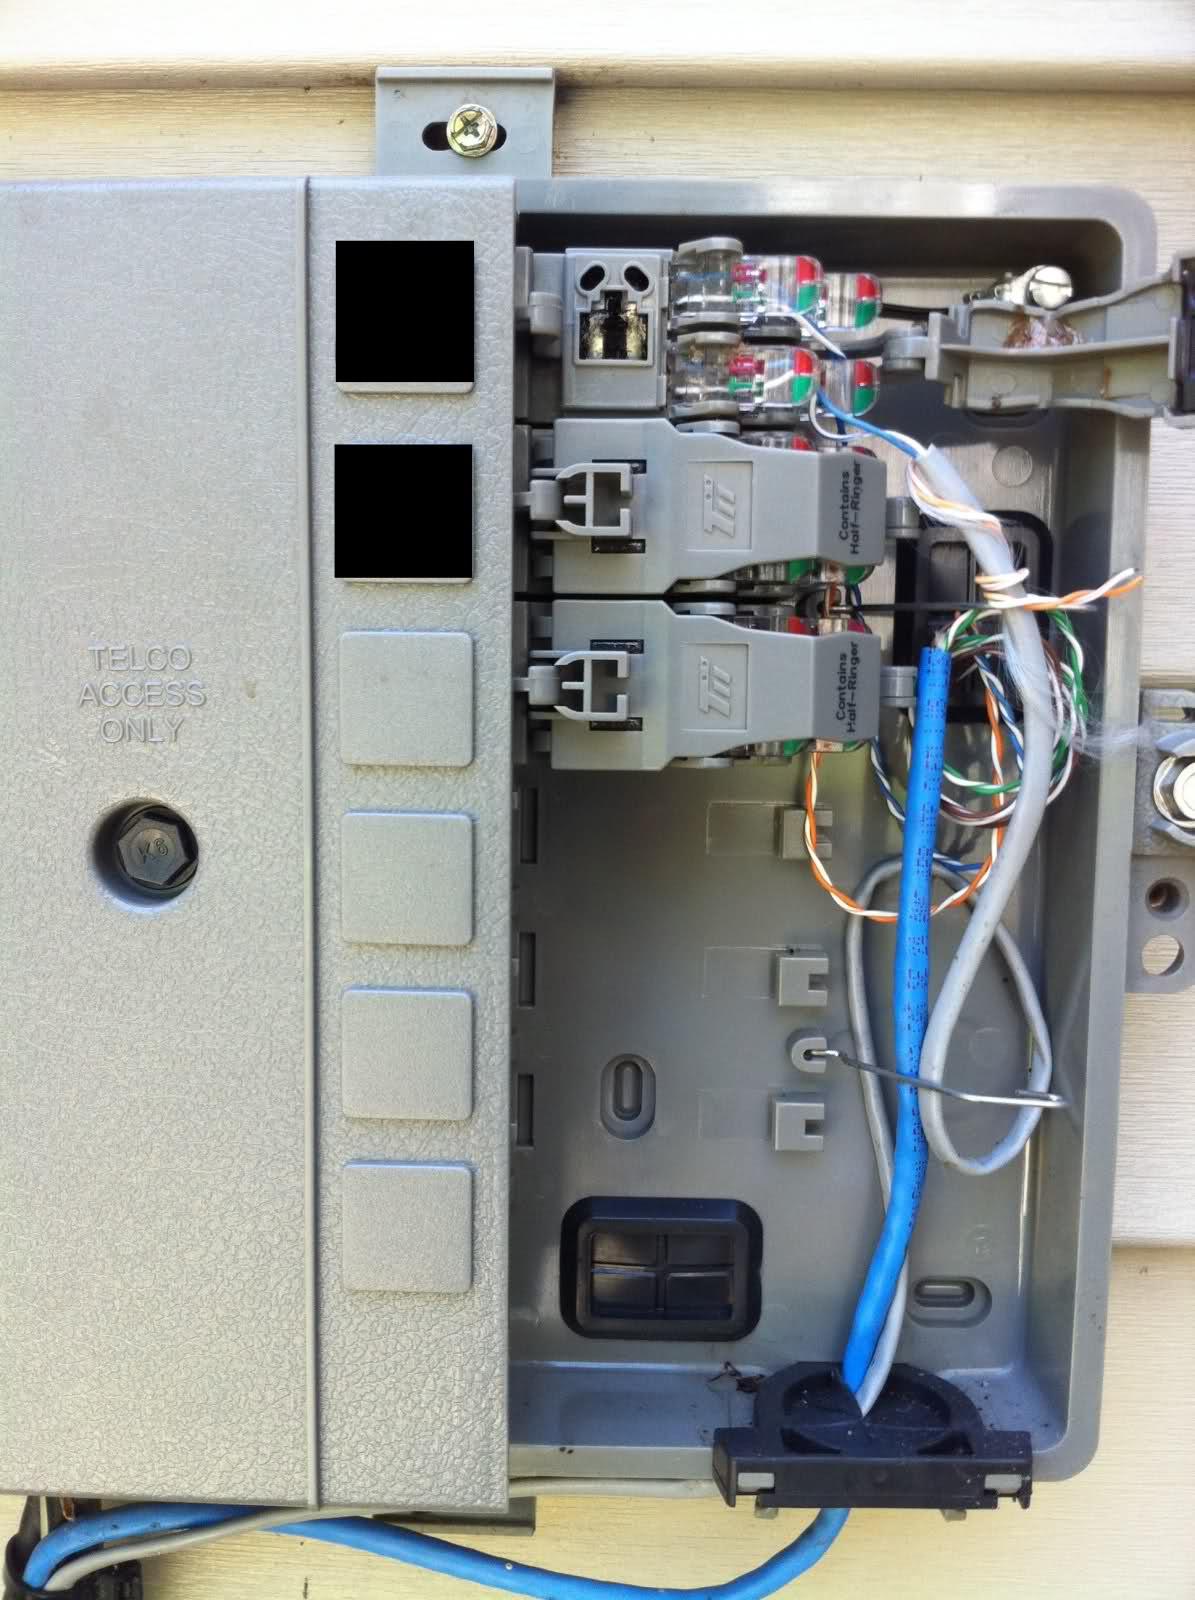 Dsl Phone Wiring Diagram   Wiring Library - Att Uverse Cat5 Wiring Diagram